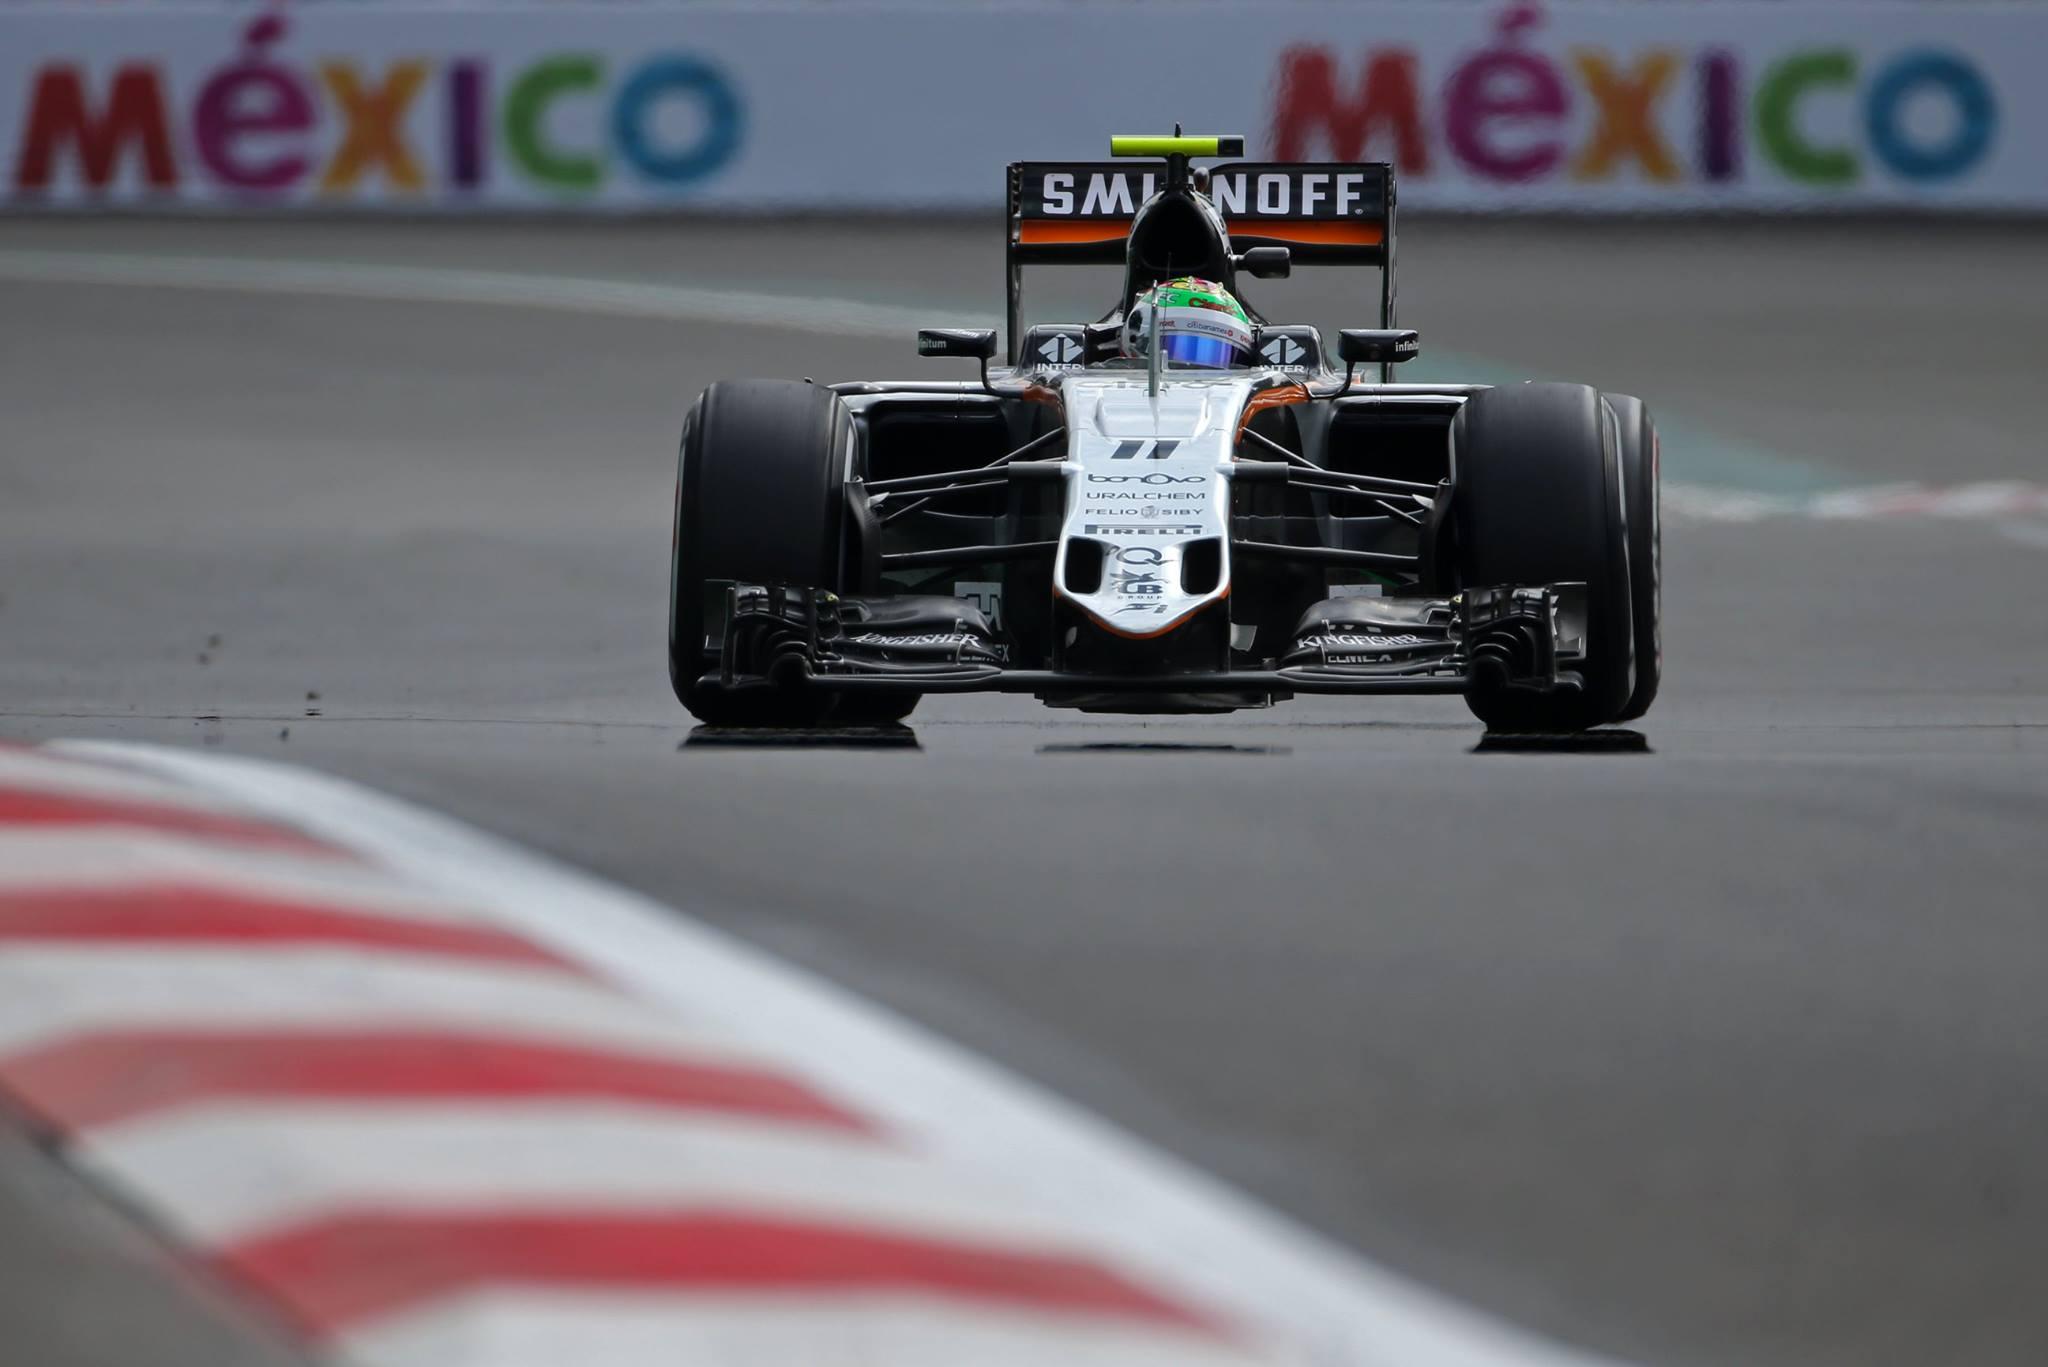 mexico_sexta_2016f1-1